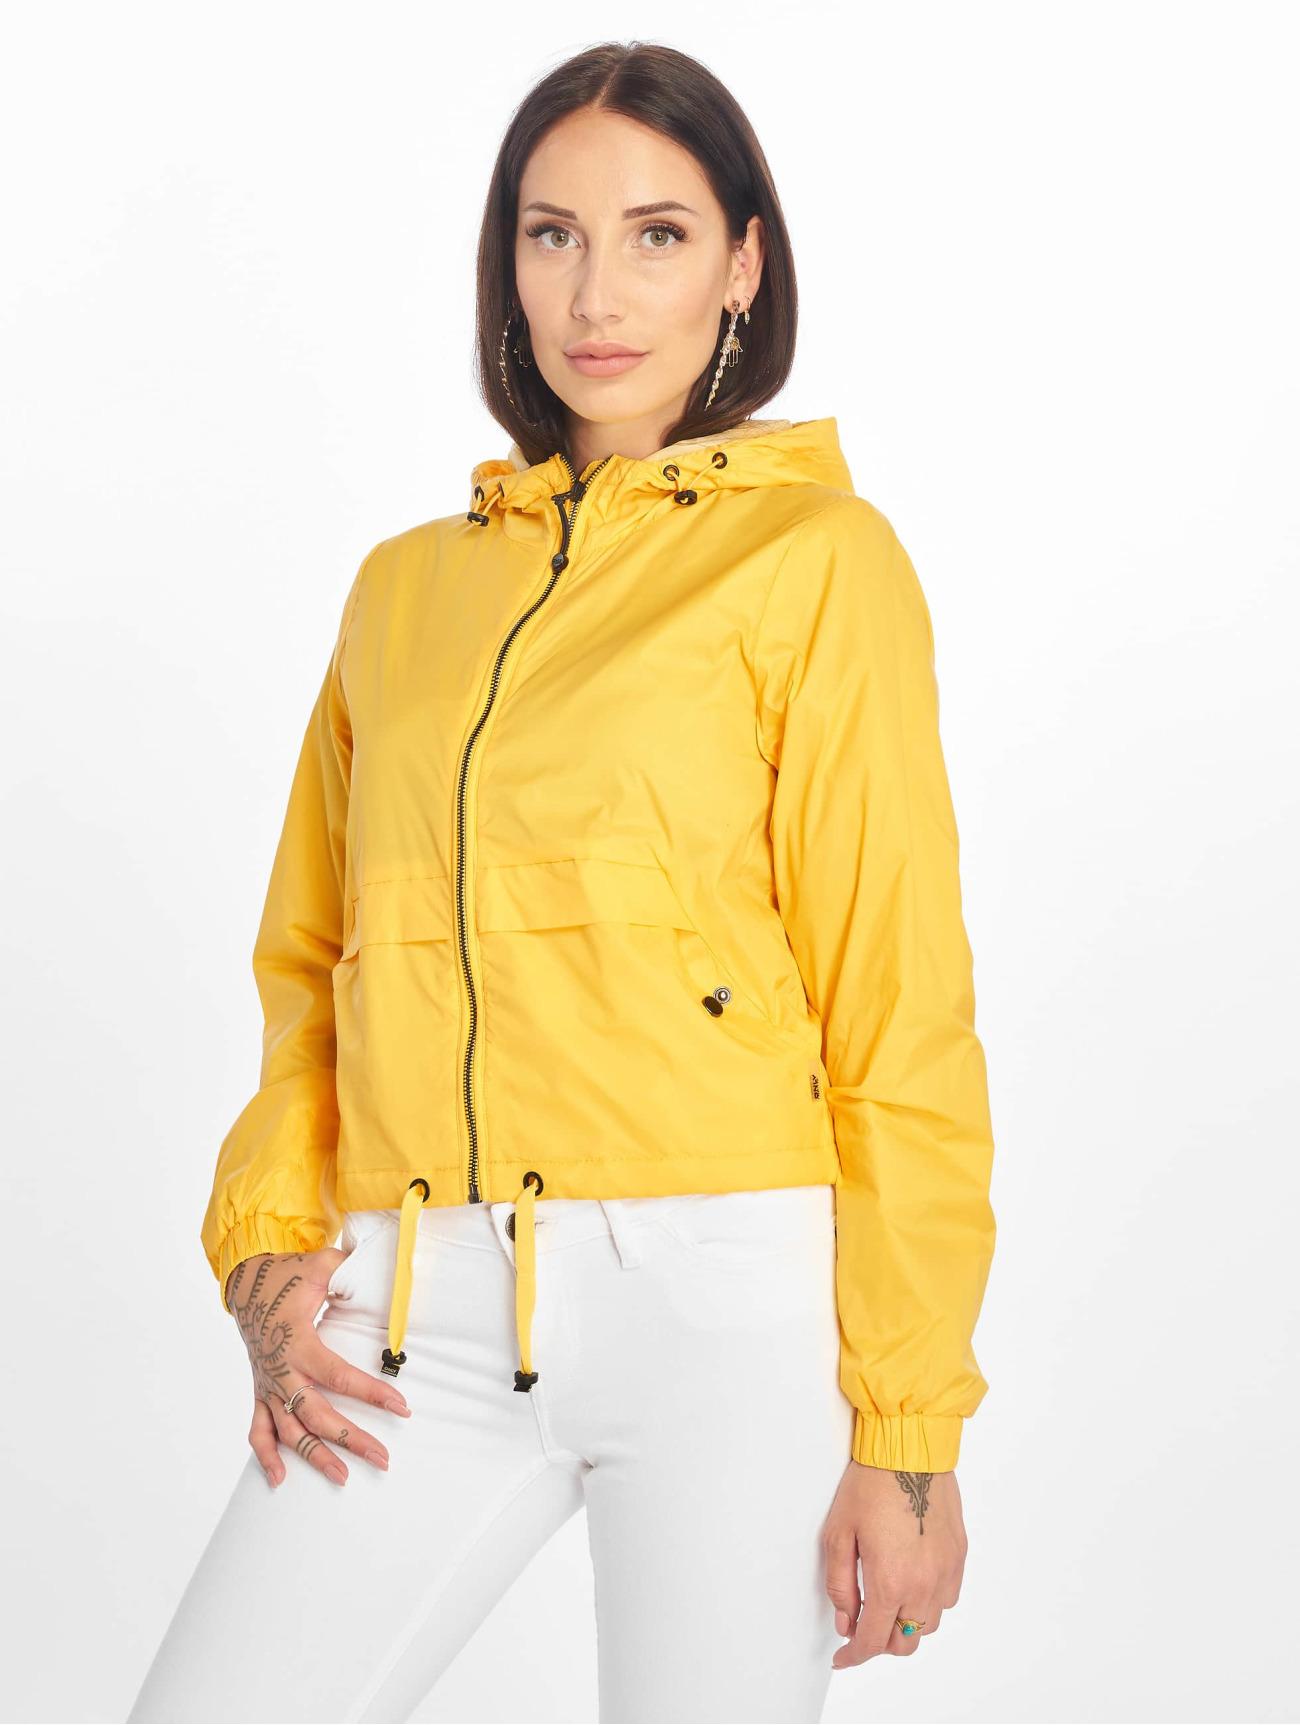 Veste legere femme jaune